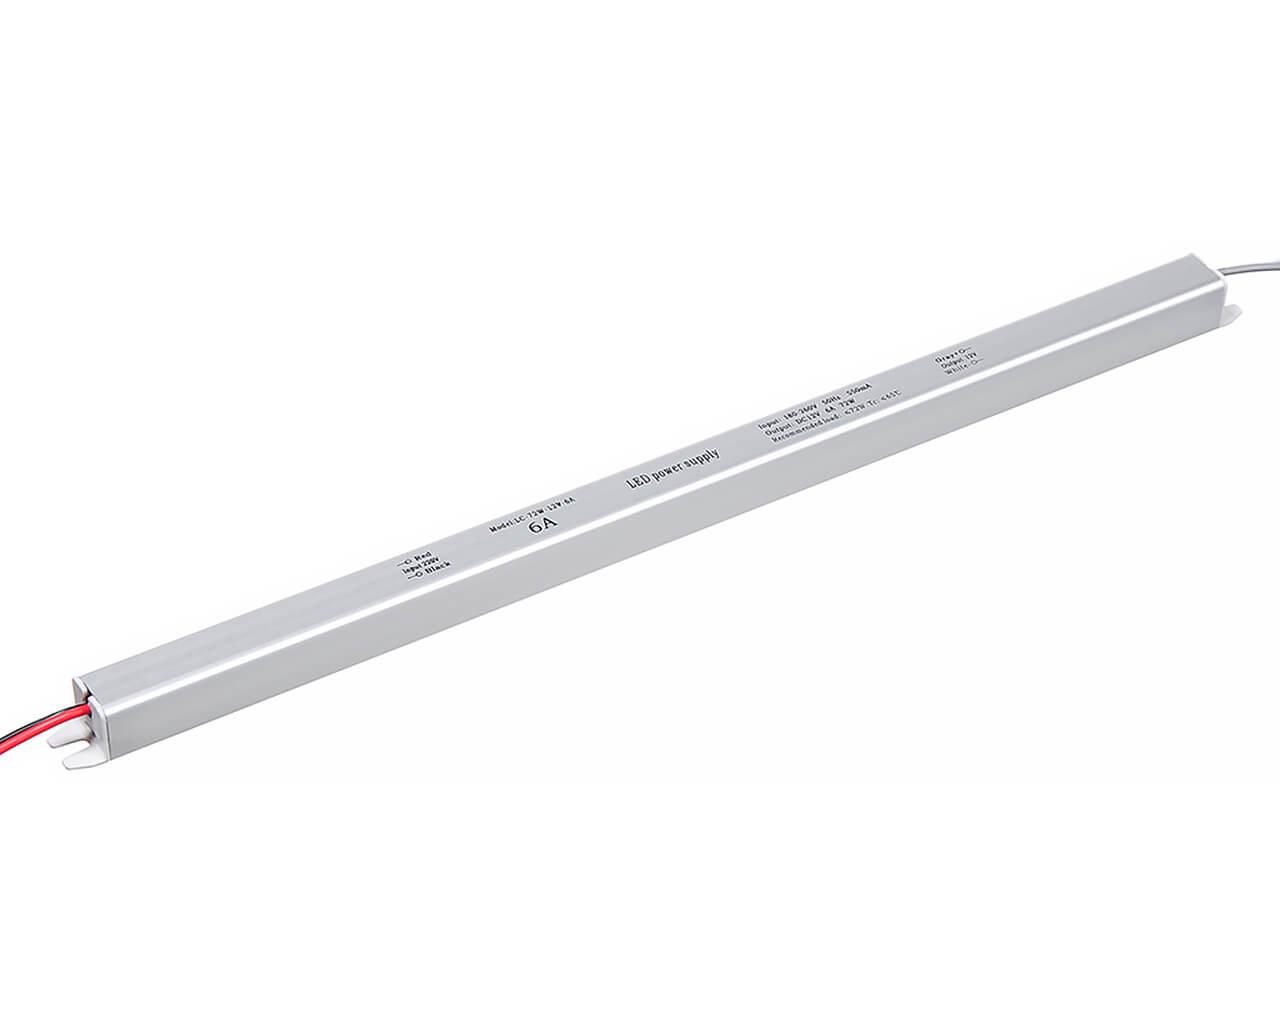 Блок питания LC-K72W-12V 6А (карандаш 372*18*18)